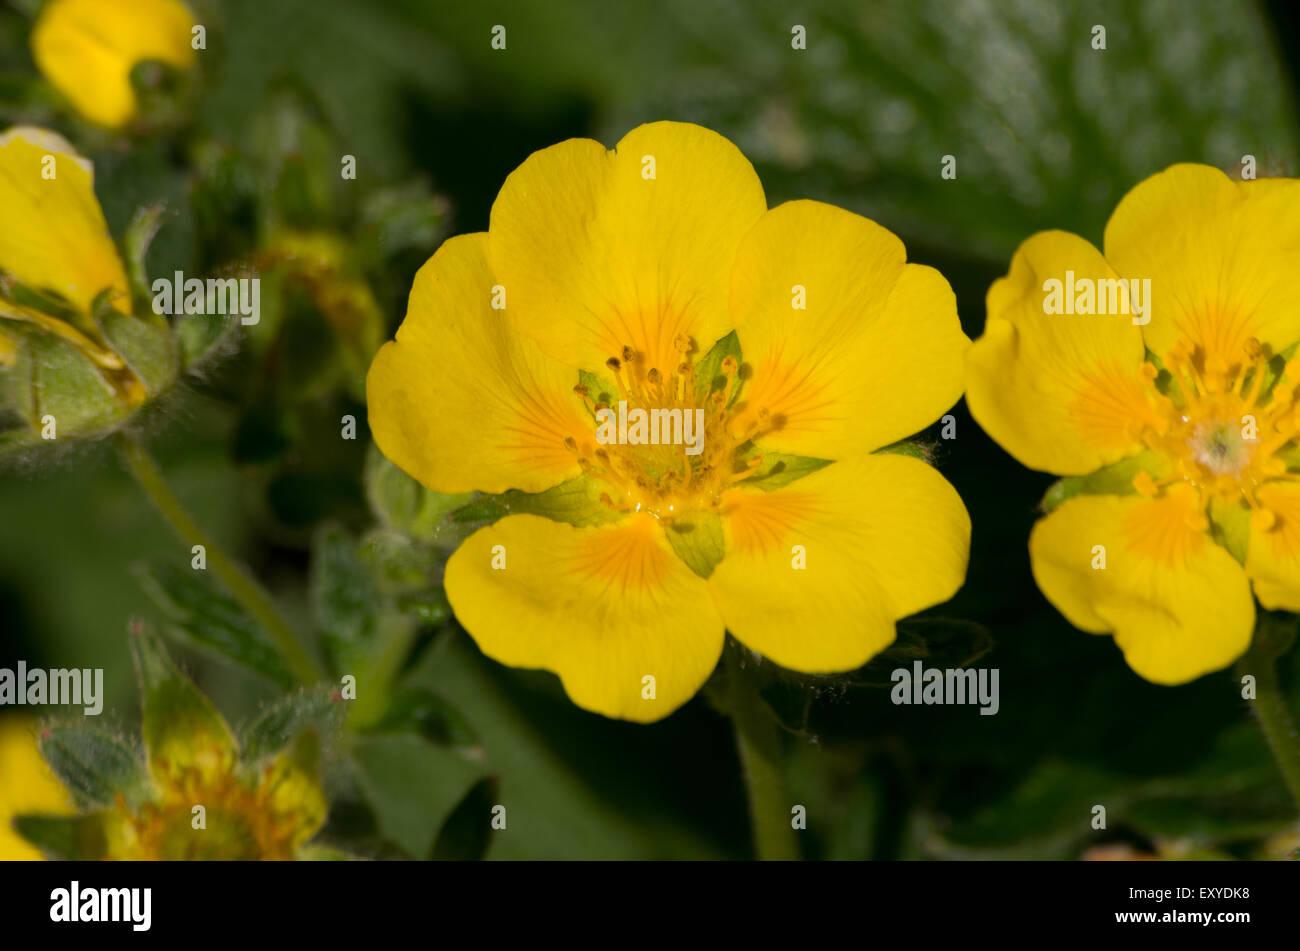 Potentilla megalantha syn fragiformis - Stock Image